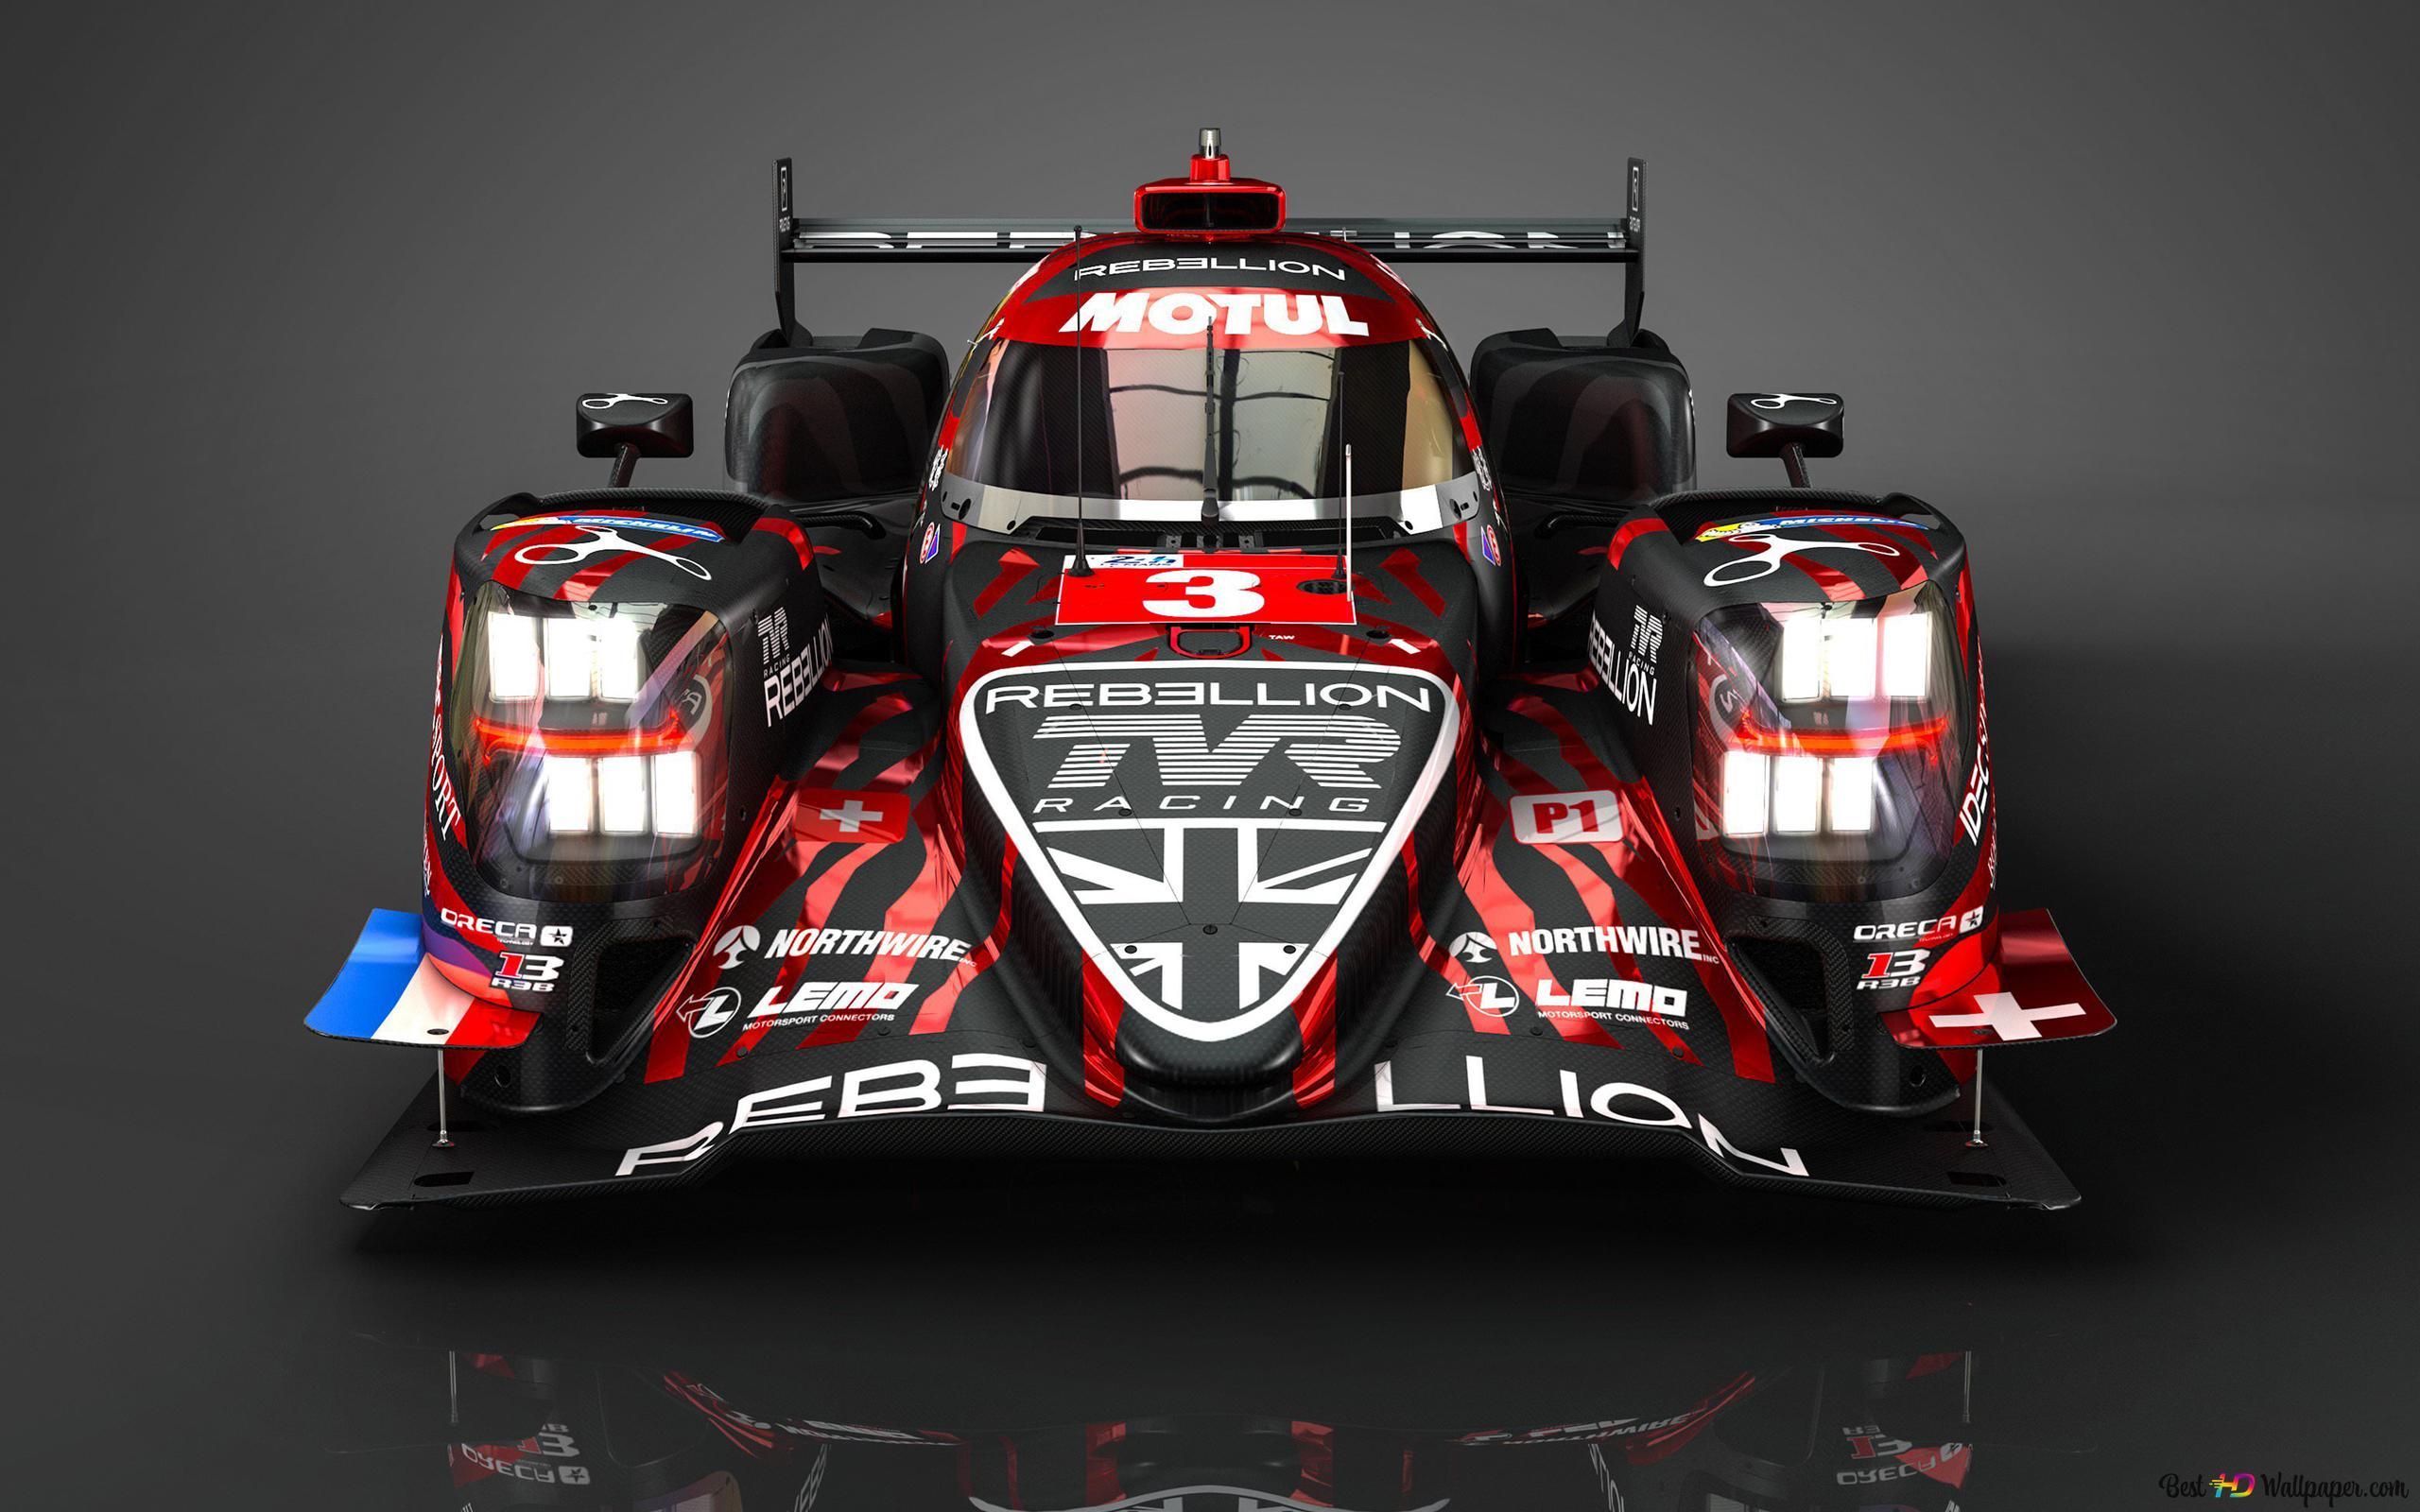 Rebellion R13 Race Car Hd Wallpaper Download